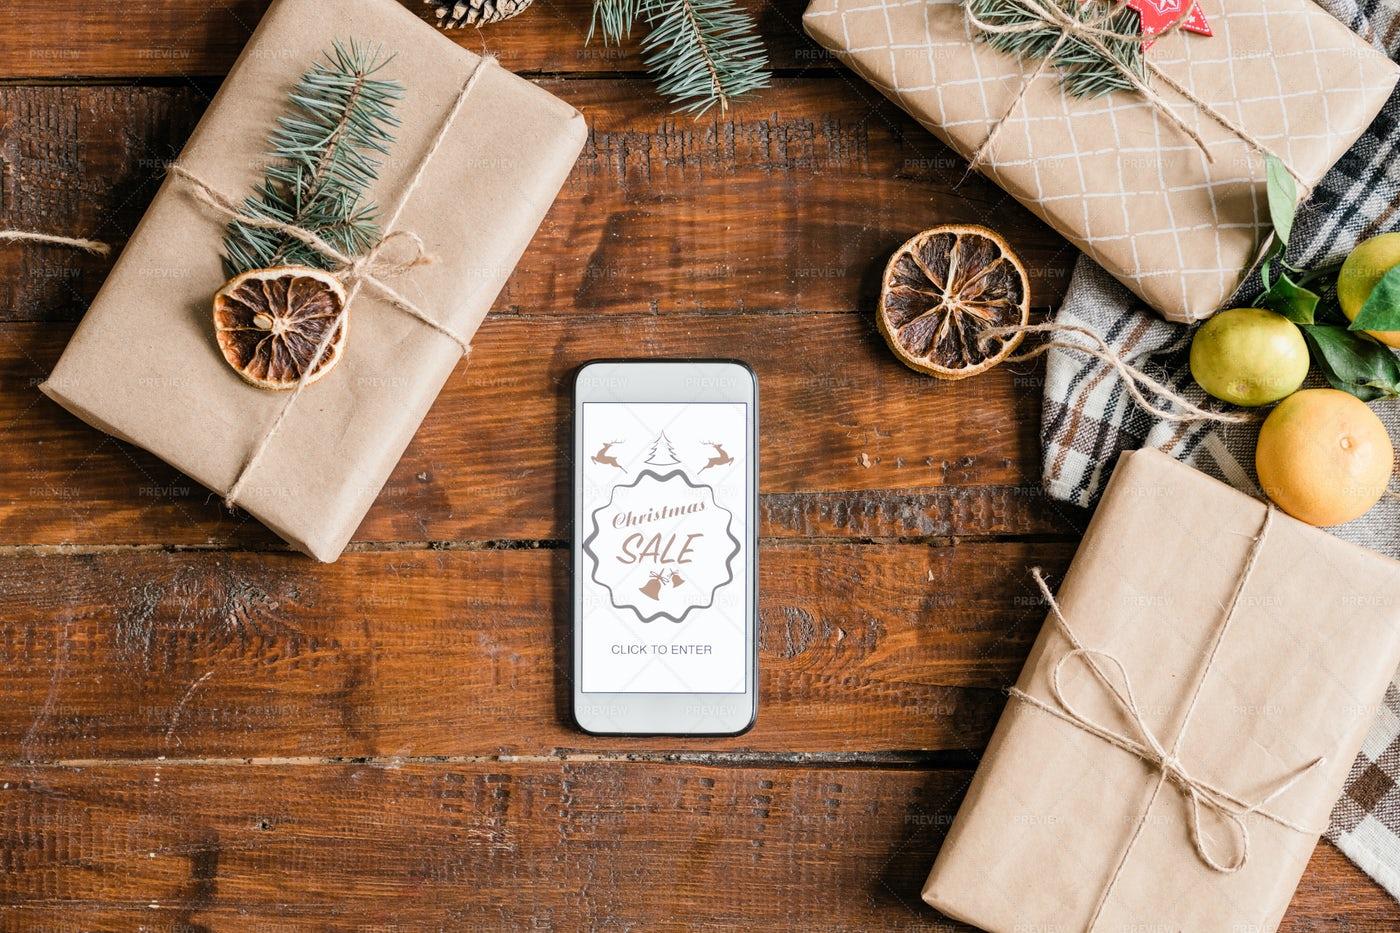 Christmas Sale On Smartphone...: Stock Photos